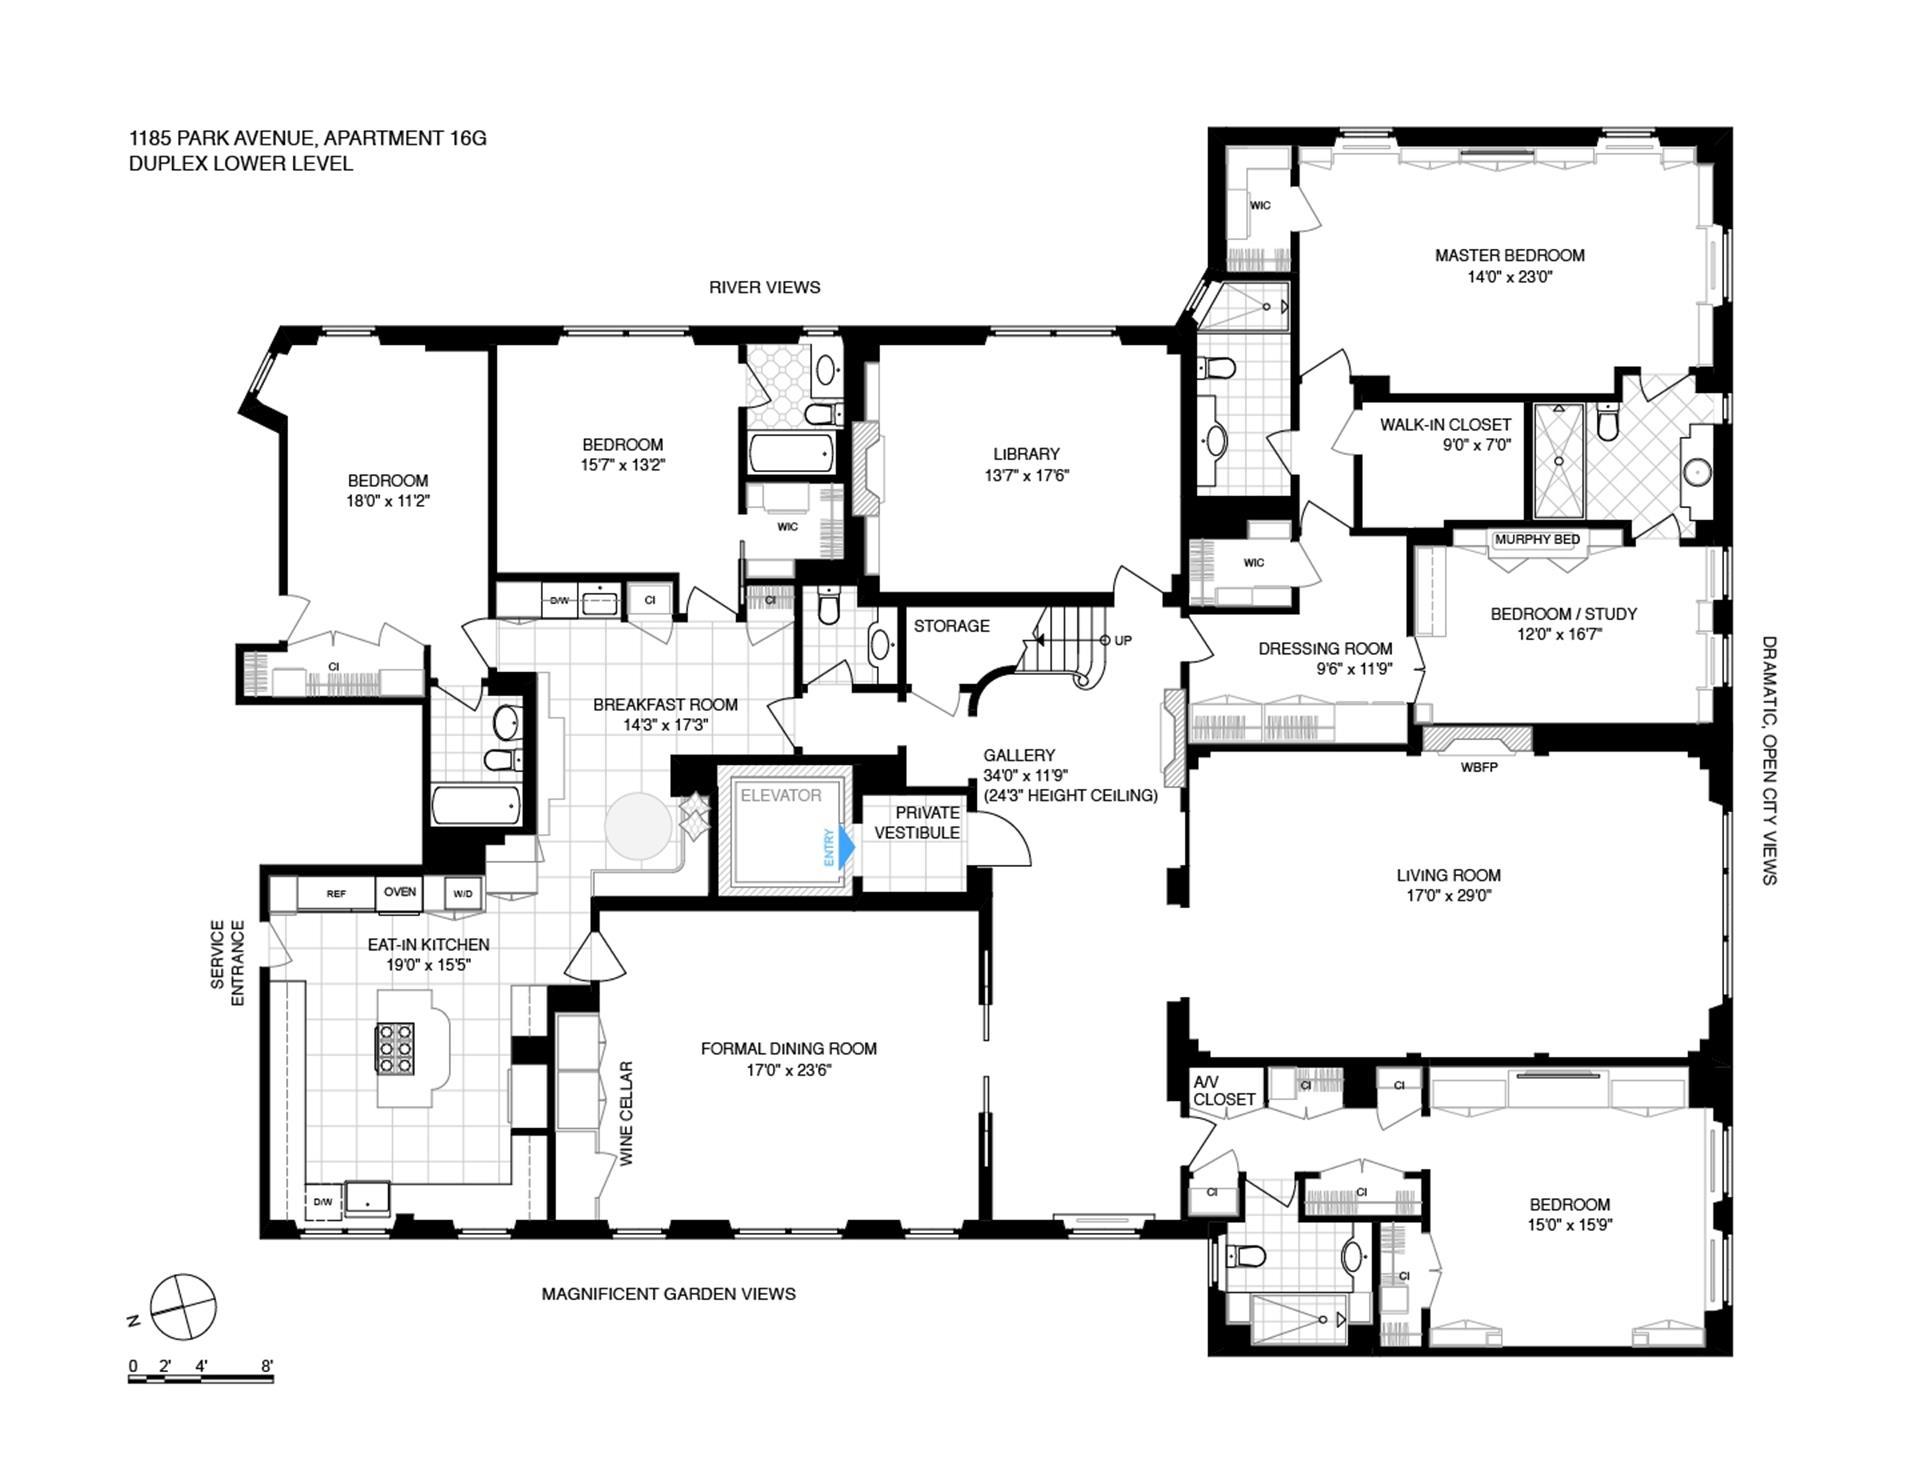 Floor plan of 1185 Park Avenue, PH16G - Carnegie Hill, New York